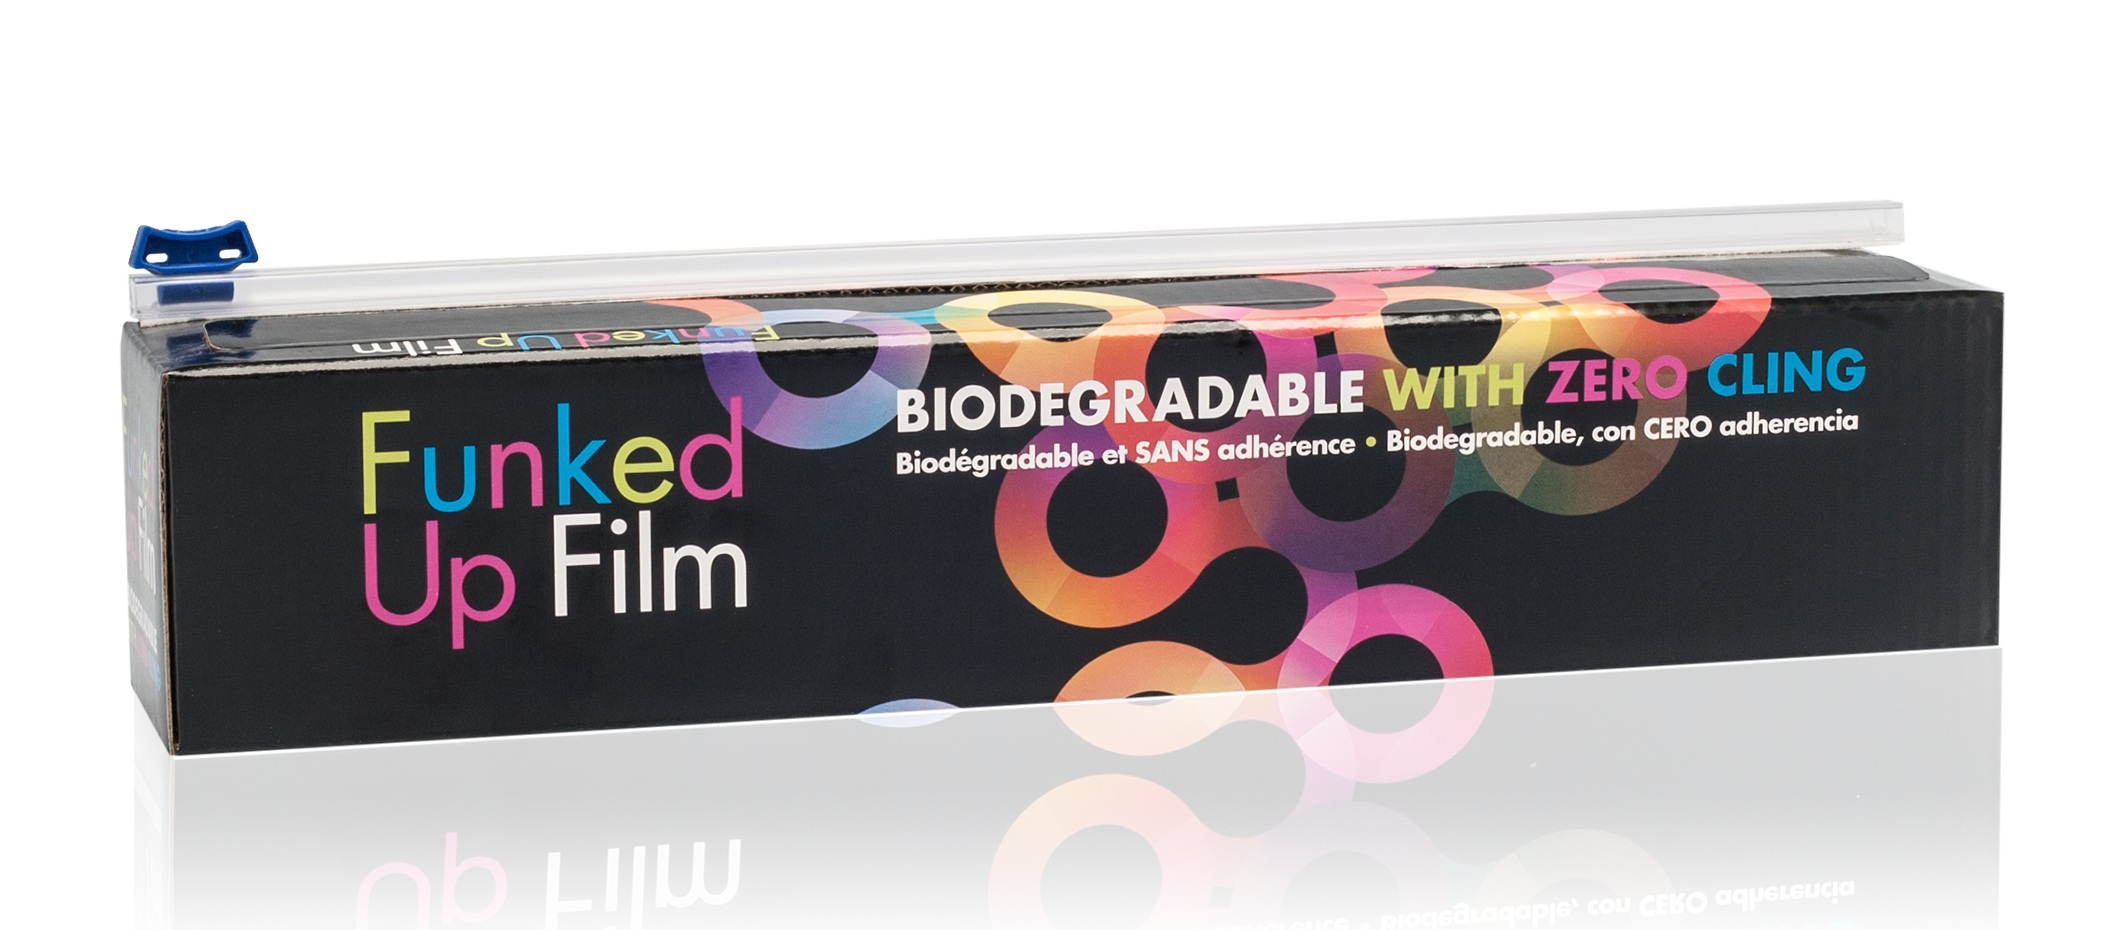 FRAMAR Пленка для окрашивания, с контролем липкости / Funked Up Film 29 см*92 м